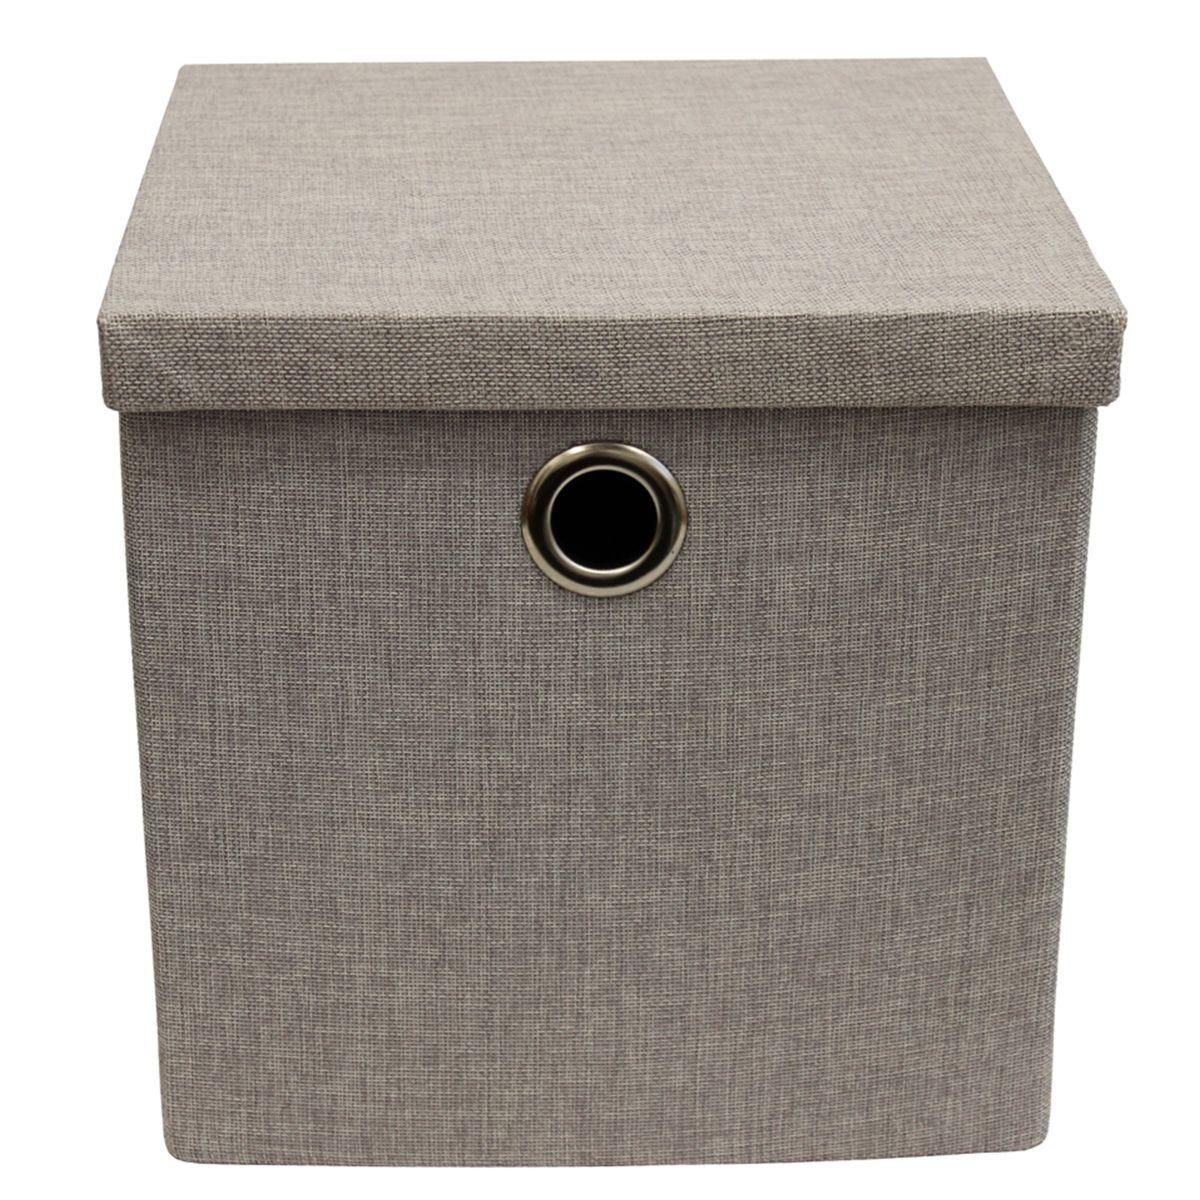 JVL Foldable Storage Box With Chrome Handles - Light Grey